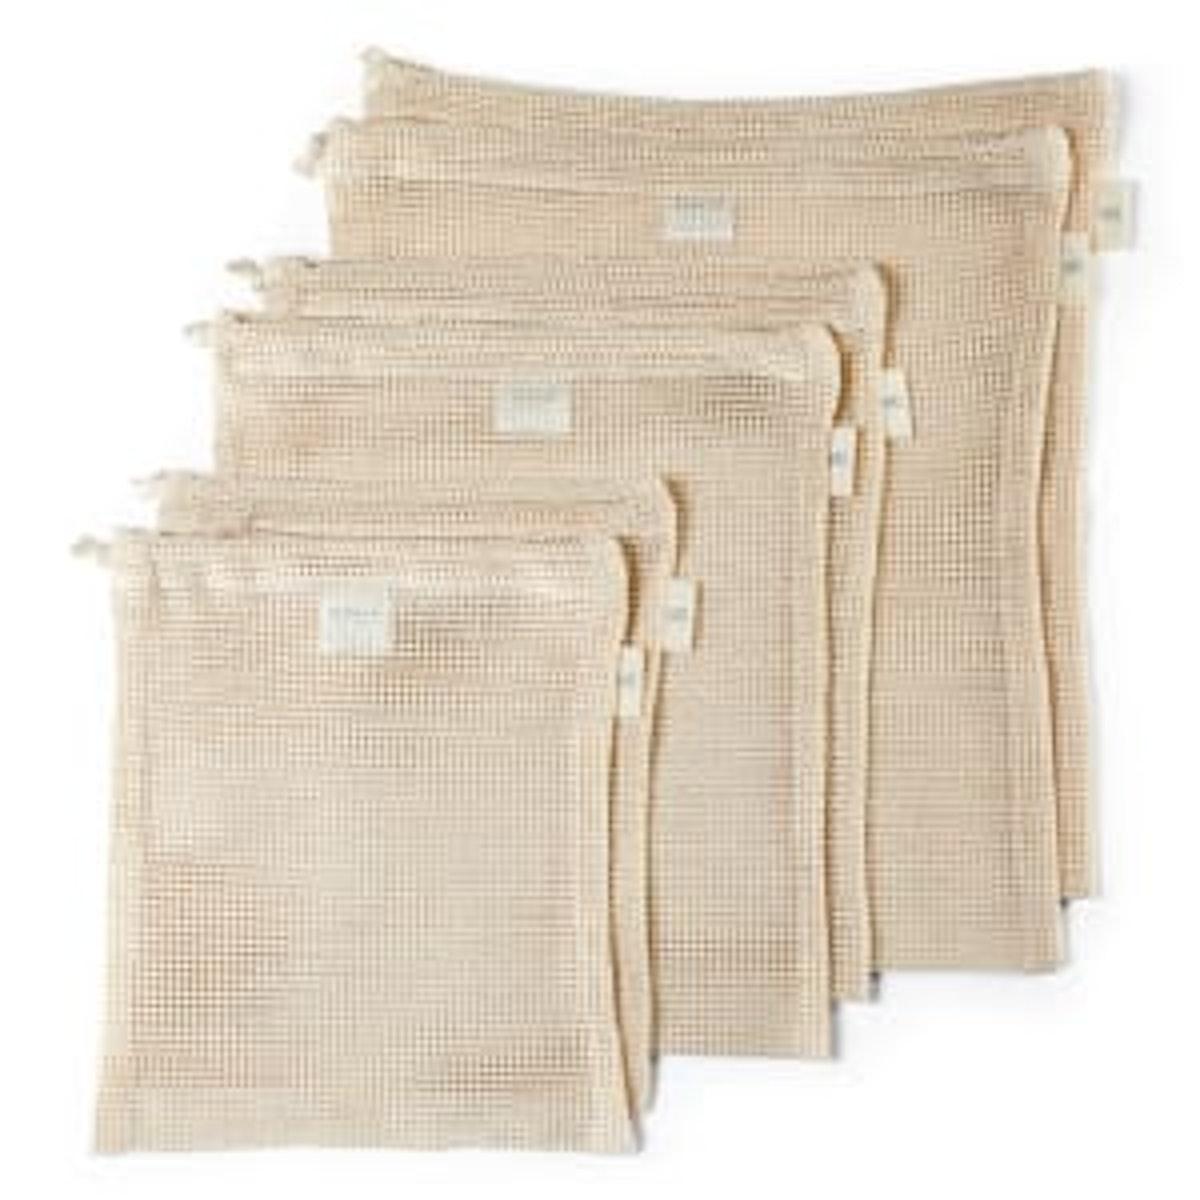 Reusable Produce Bags